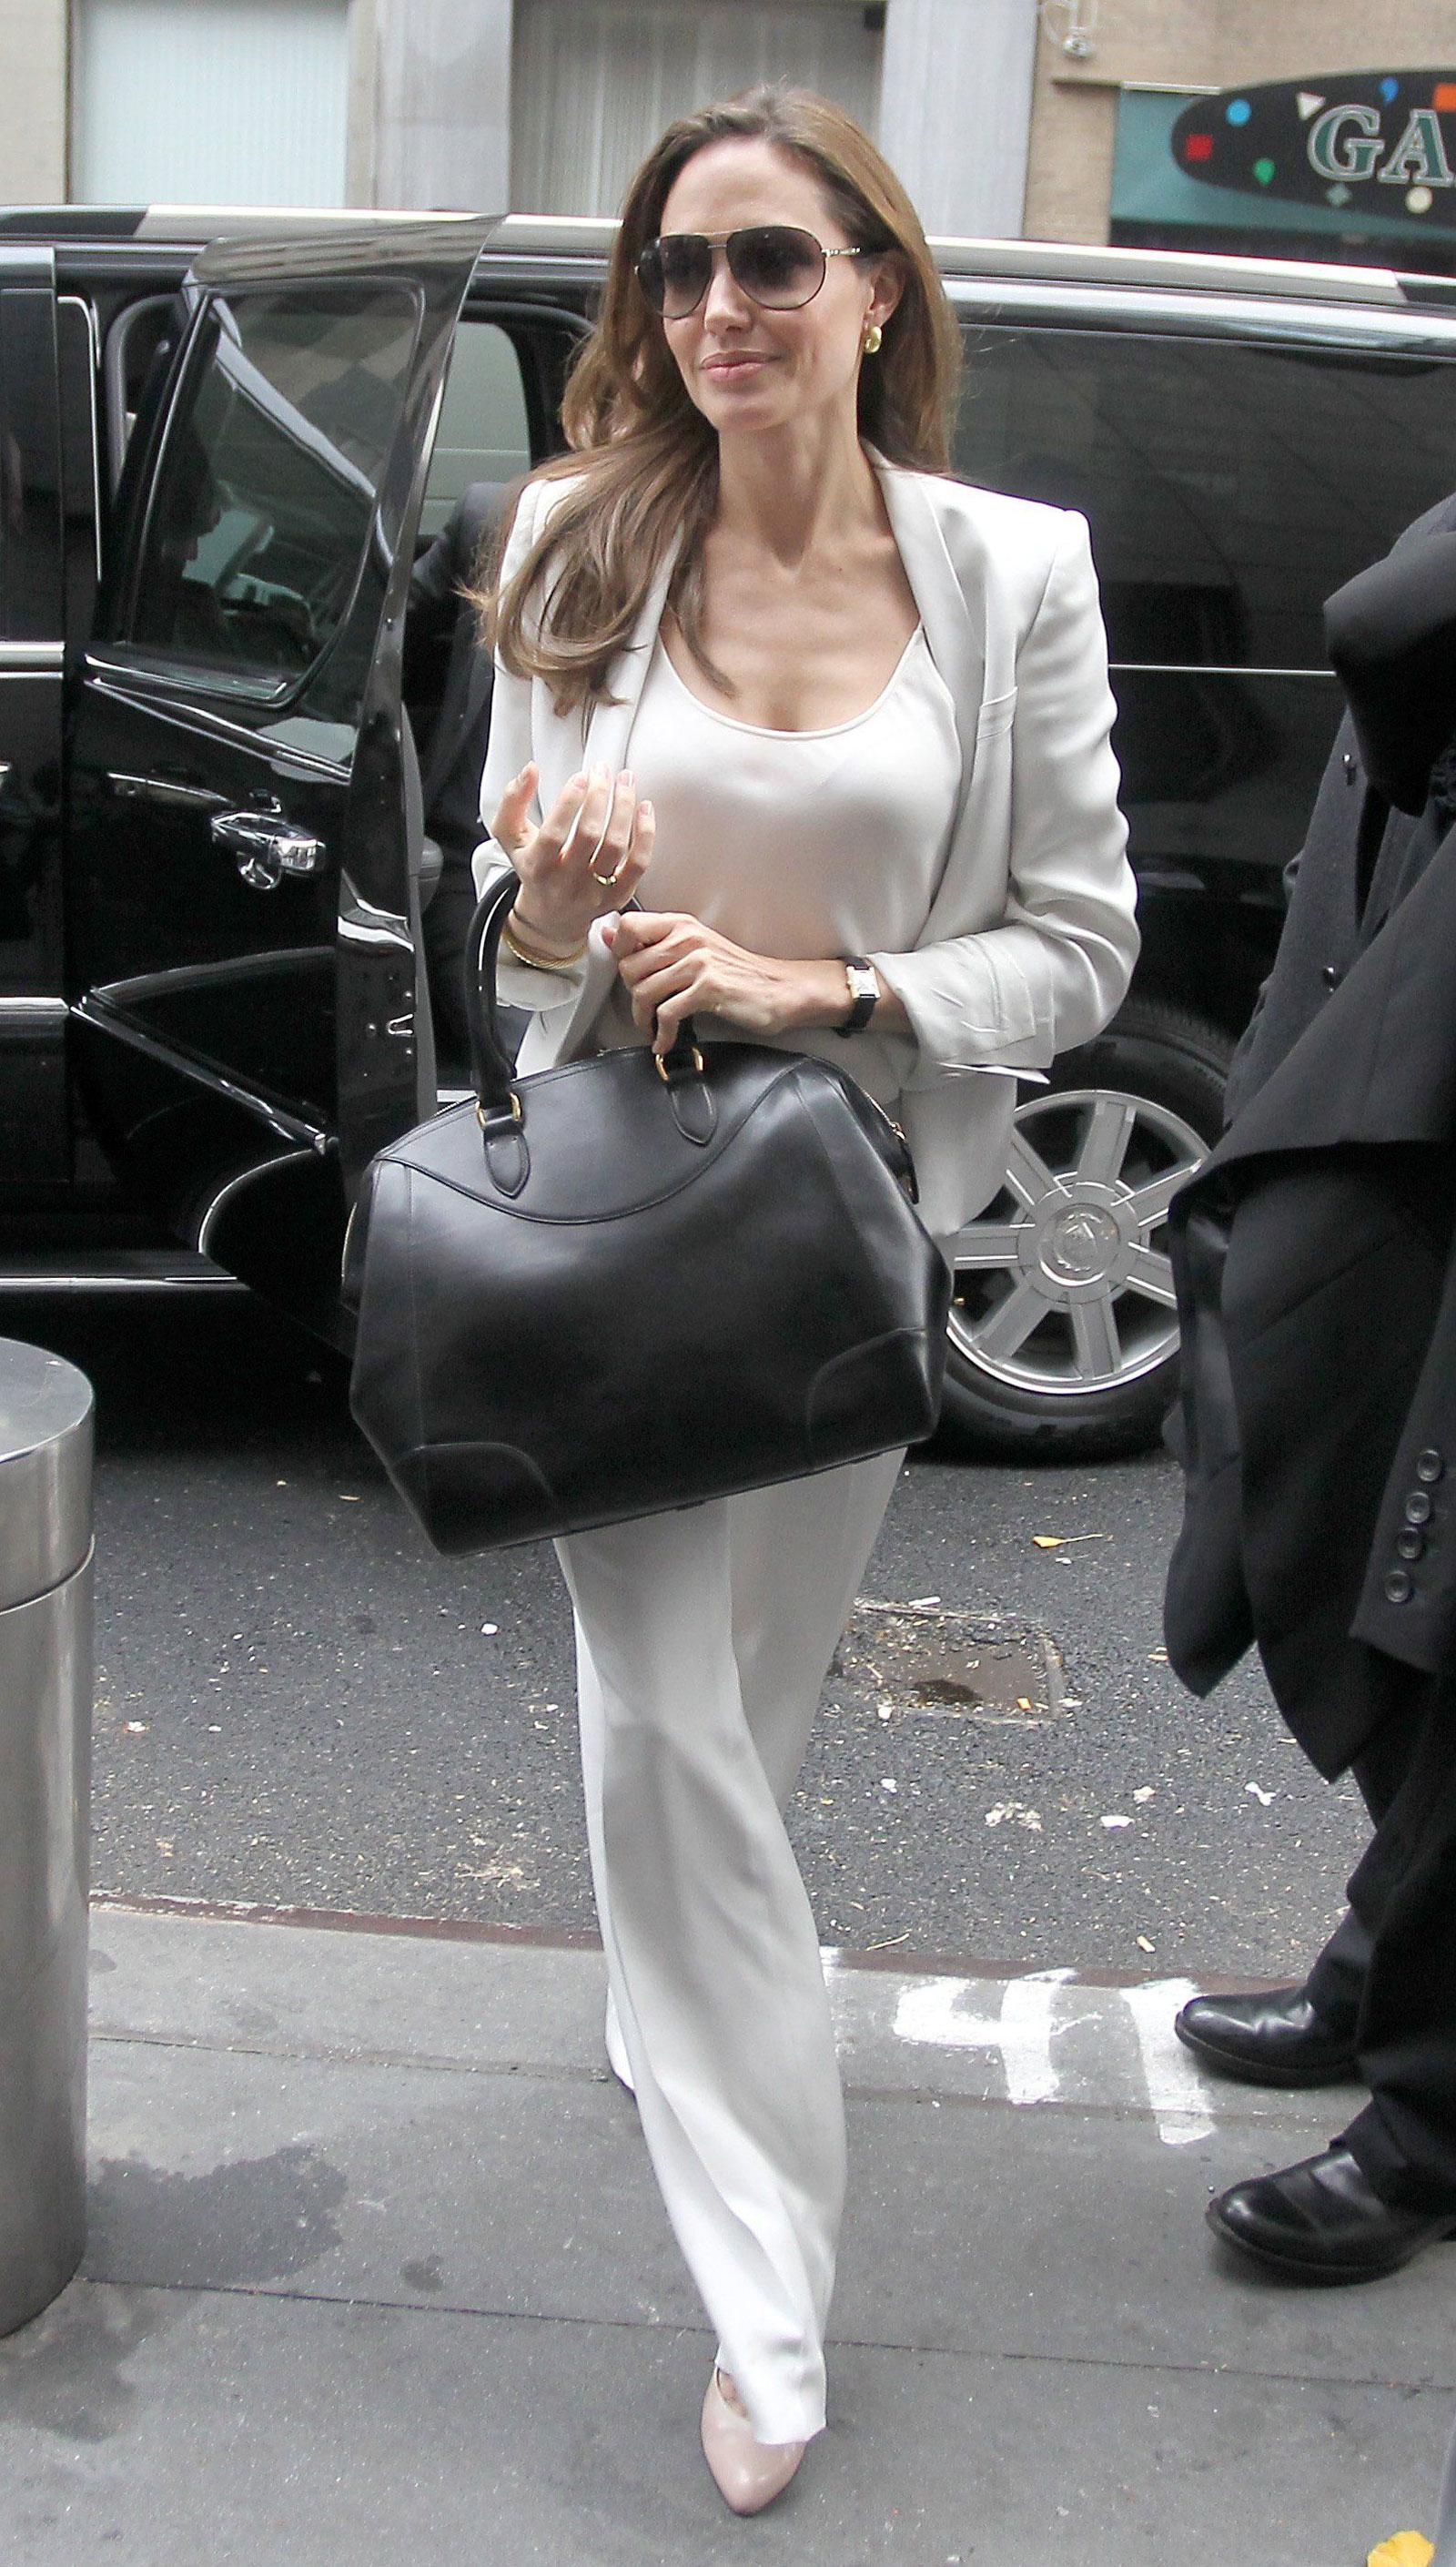 Angelina jolie no clothes video, priya sex story tmail